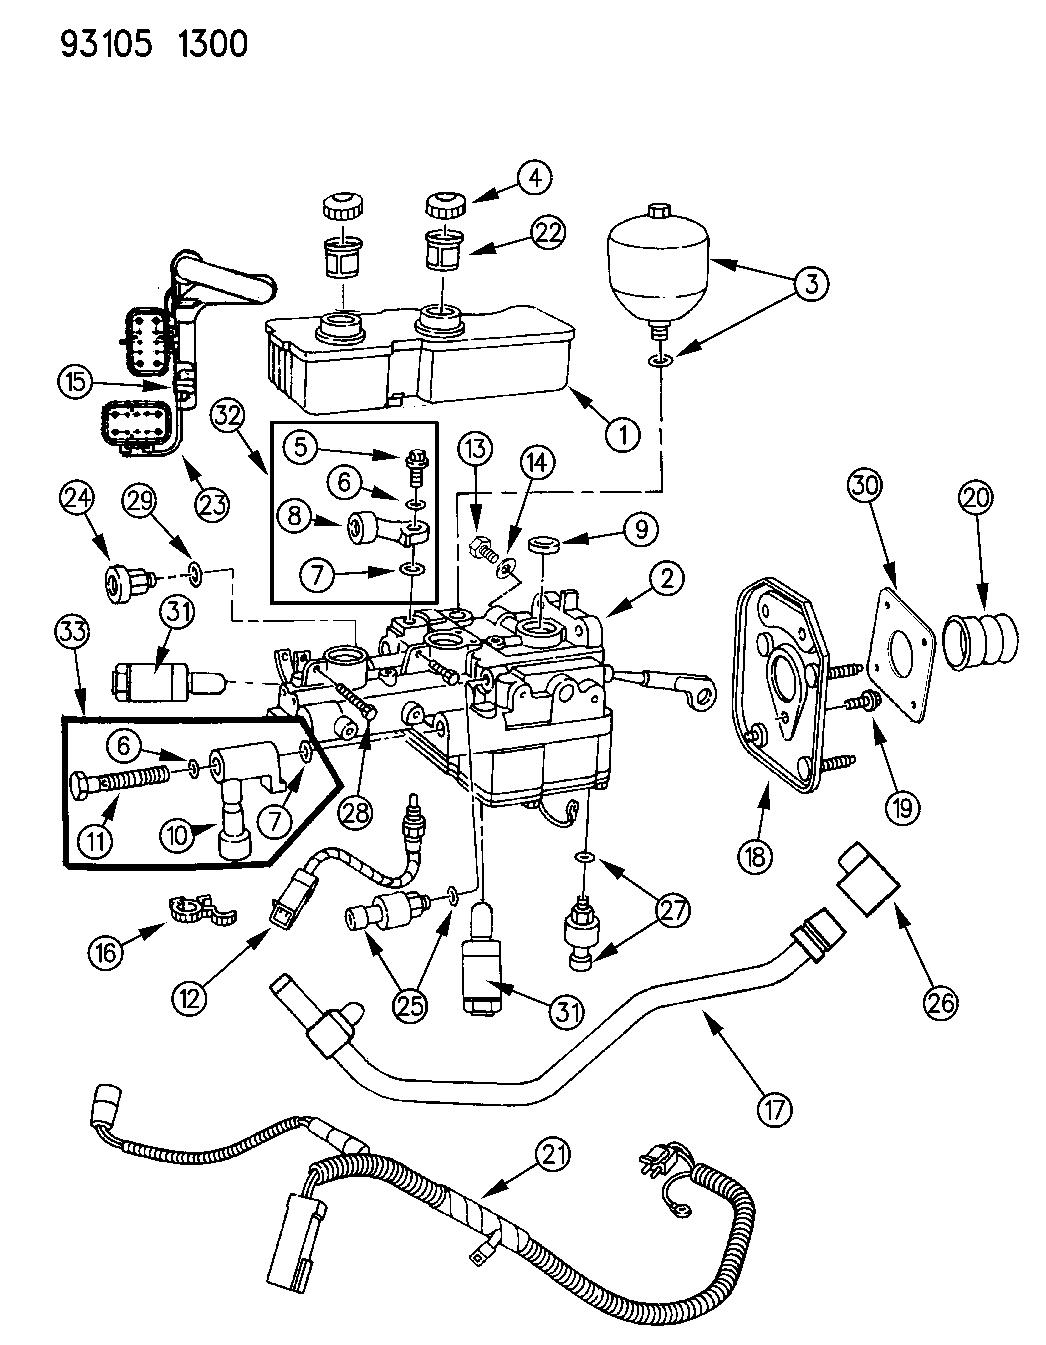 r4683522